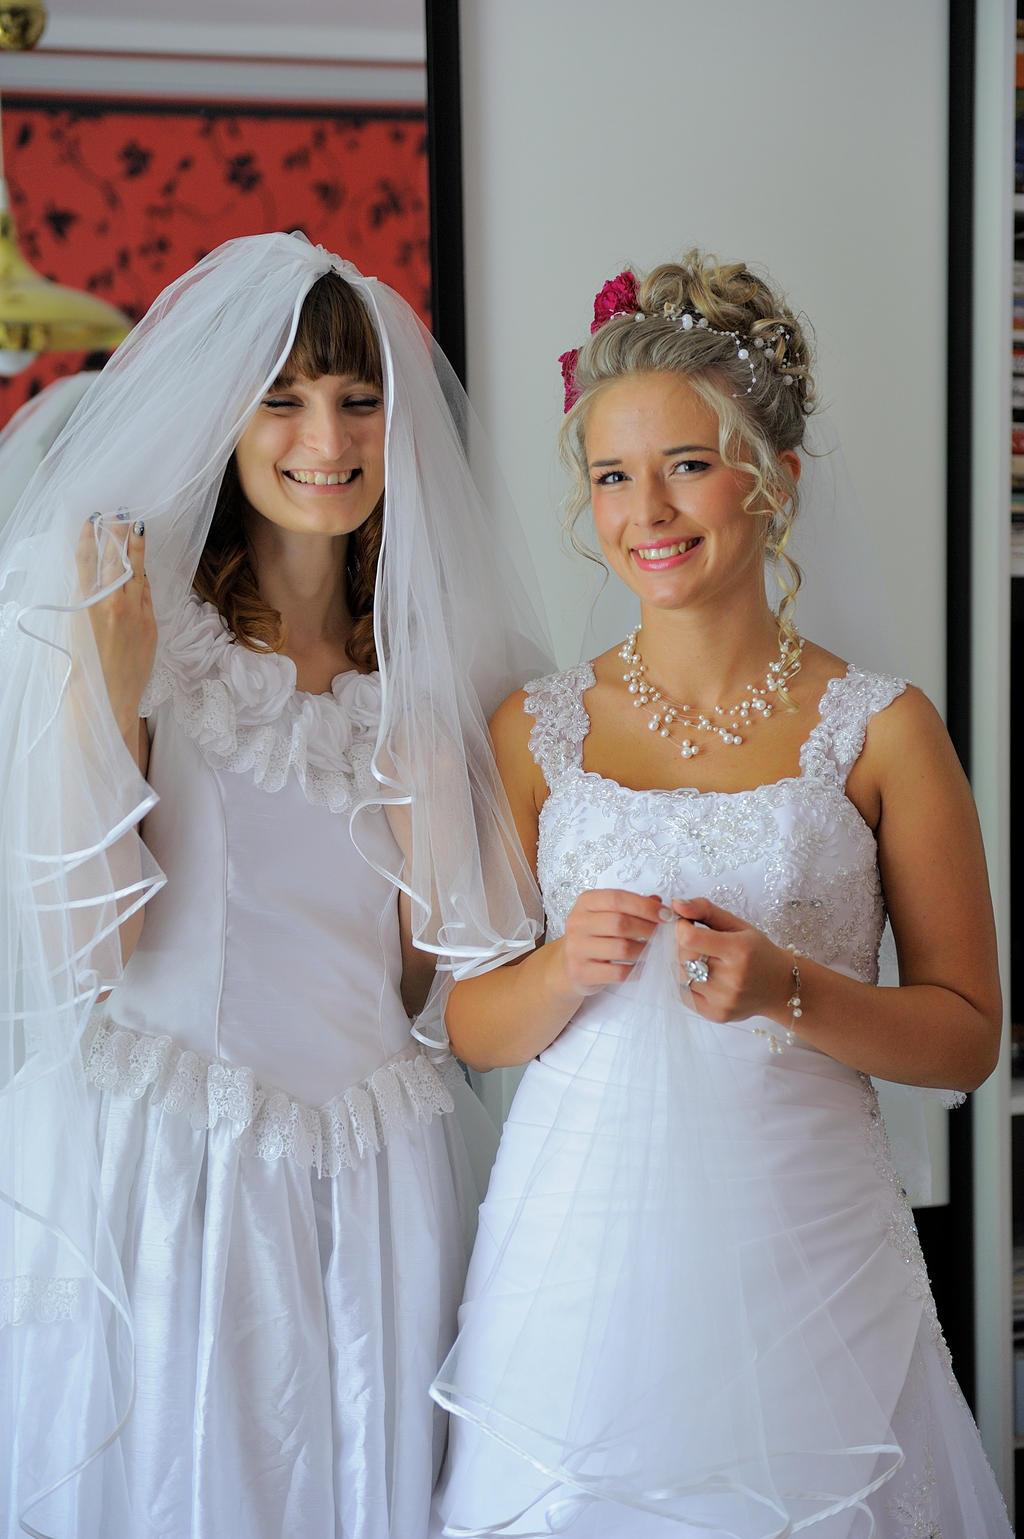 My wedding by niziolek